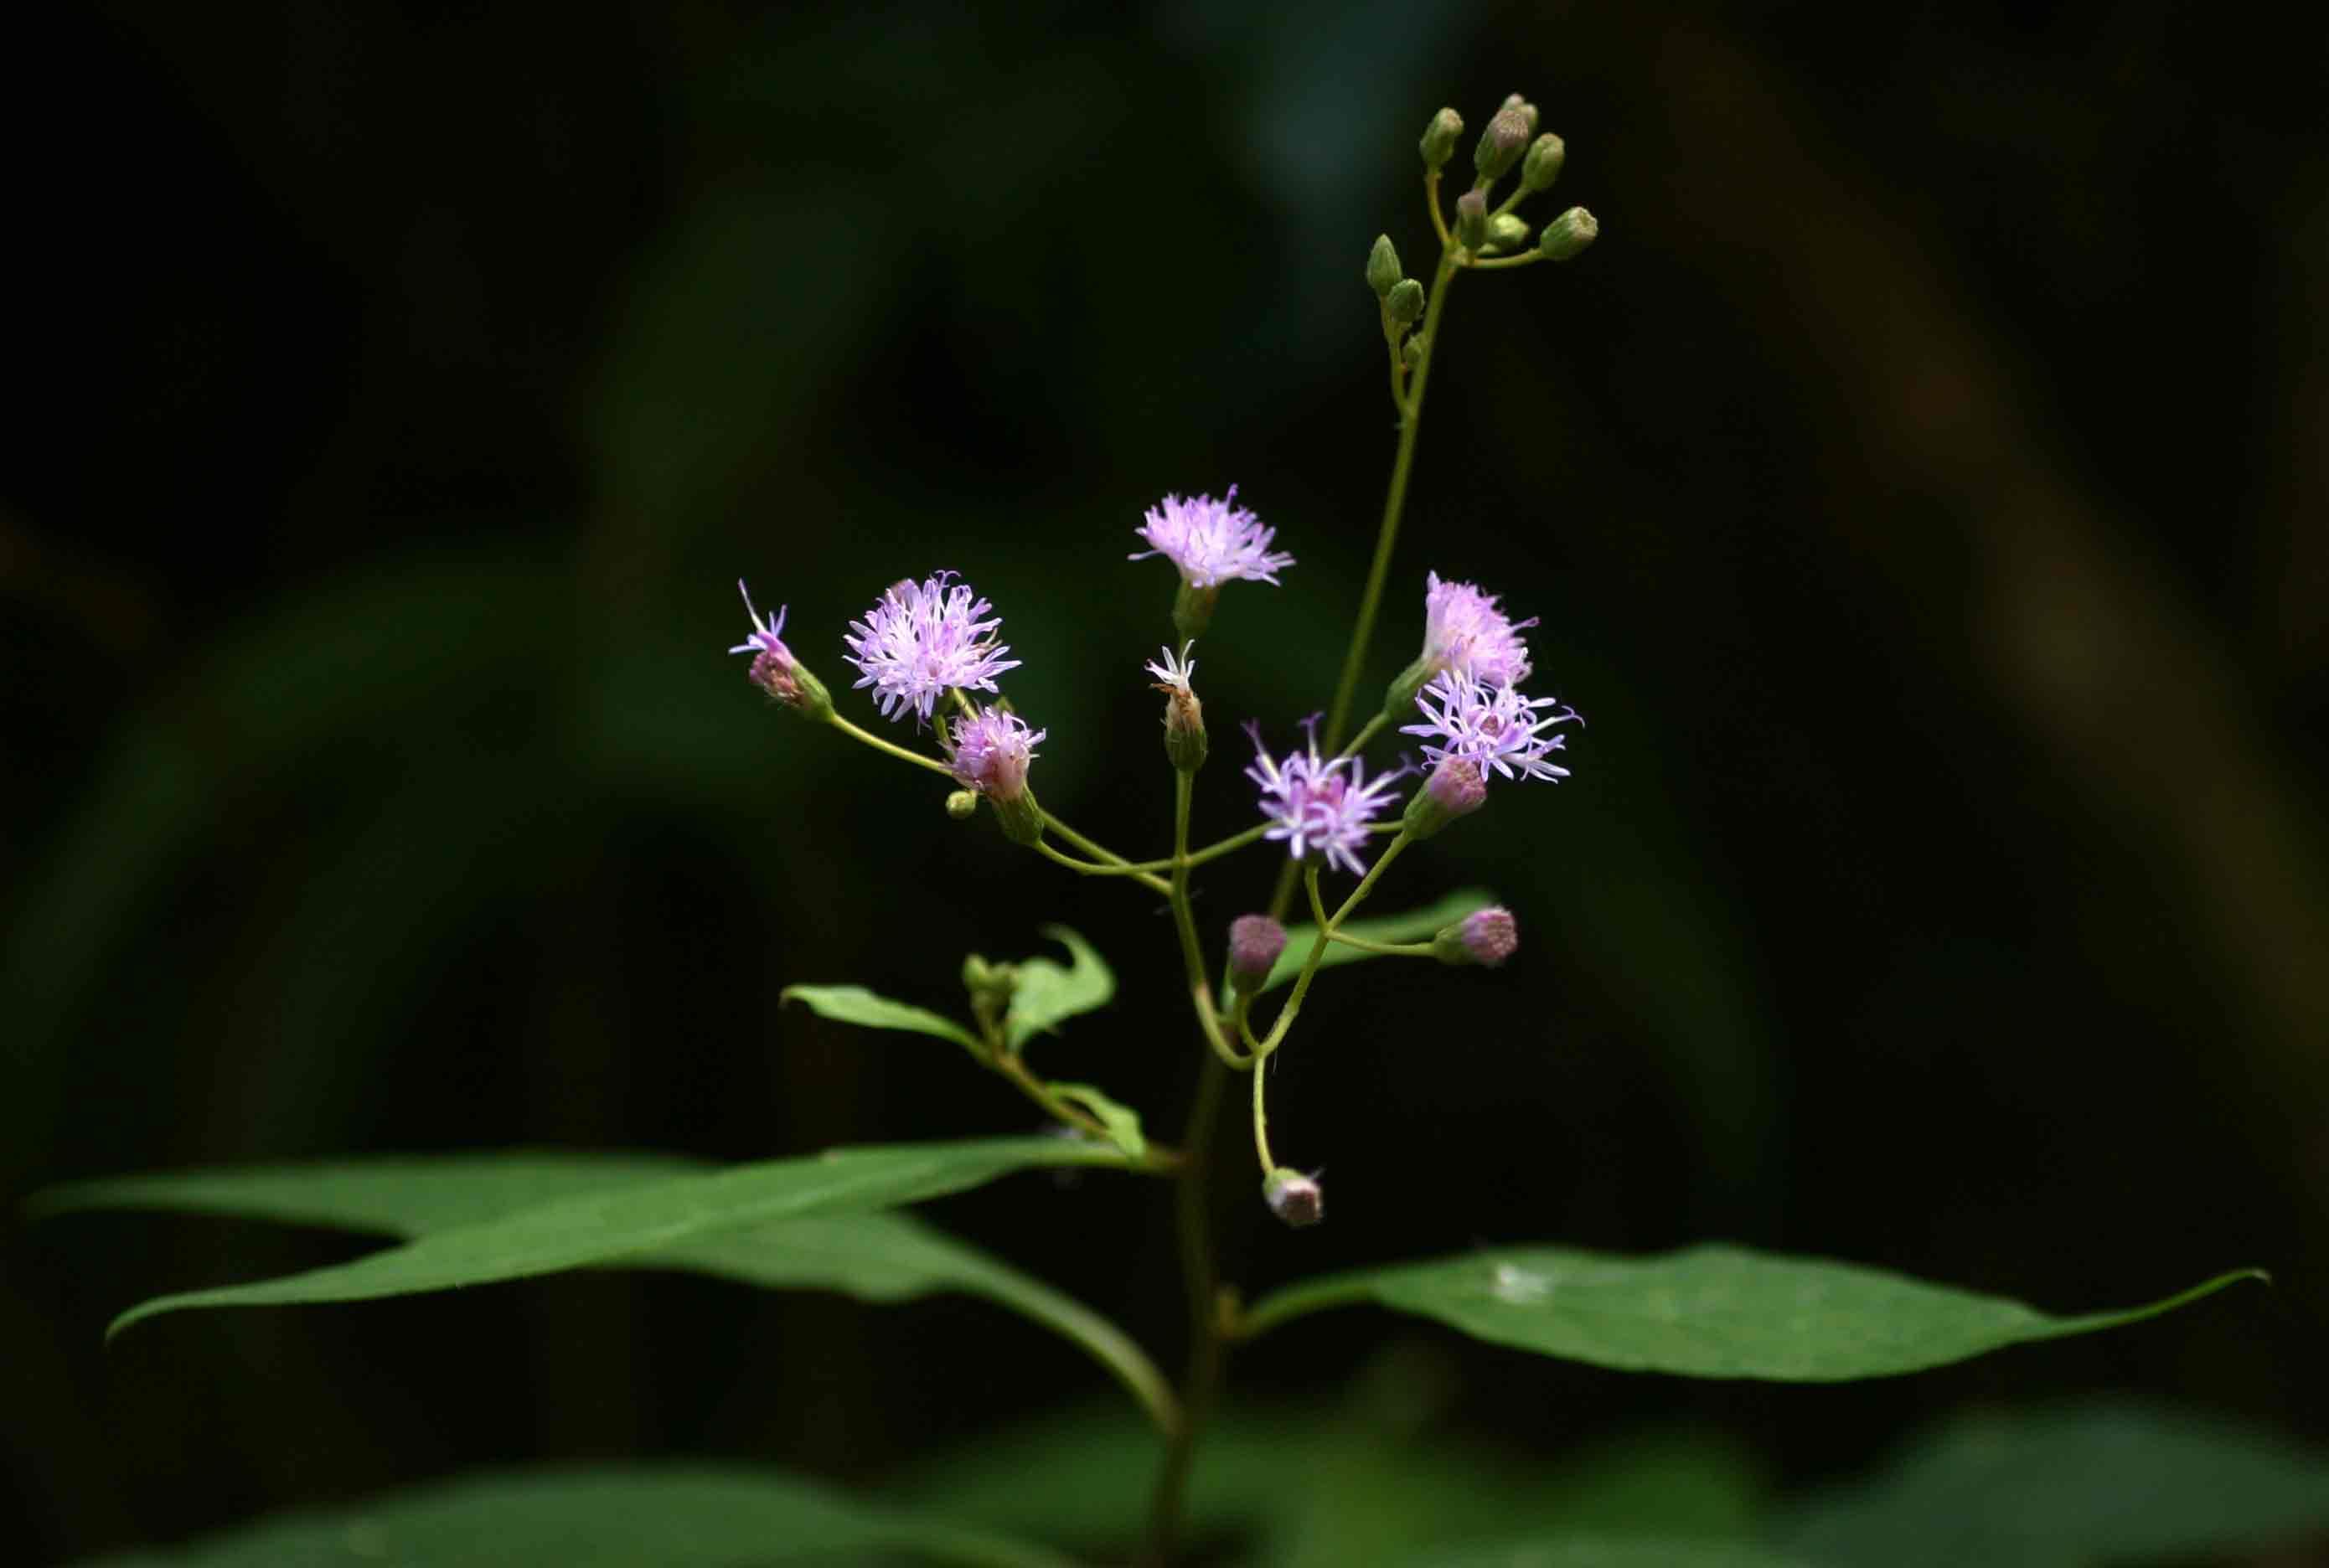 Vernonia wollastonii